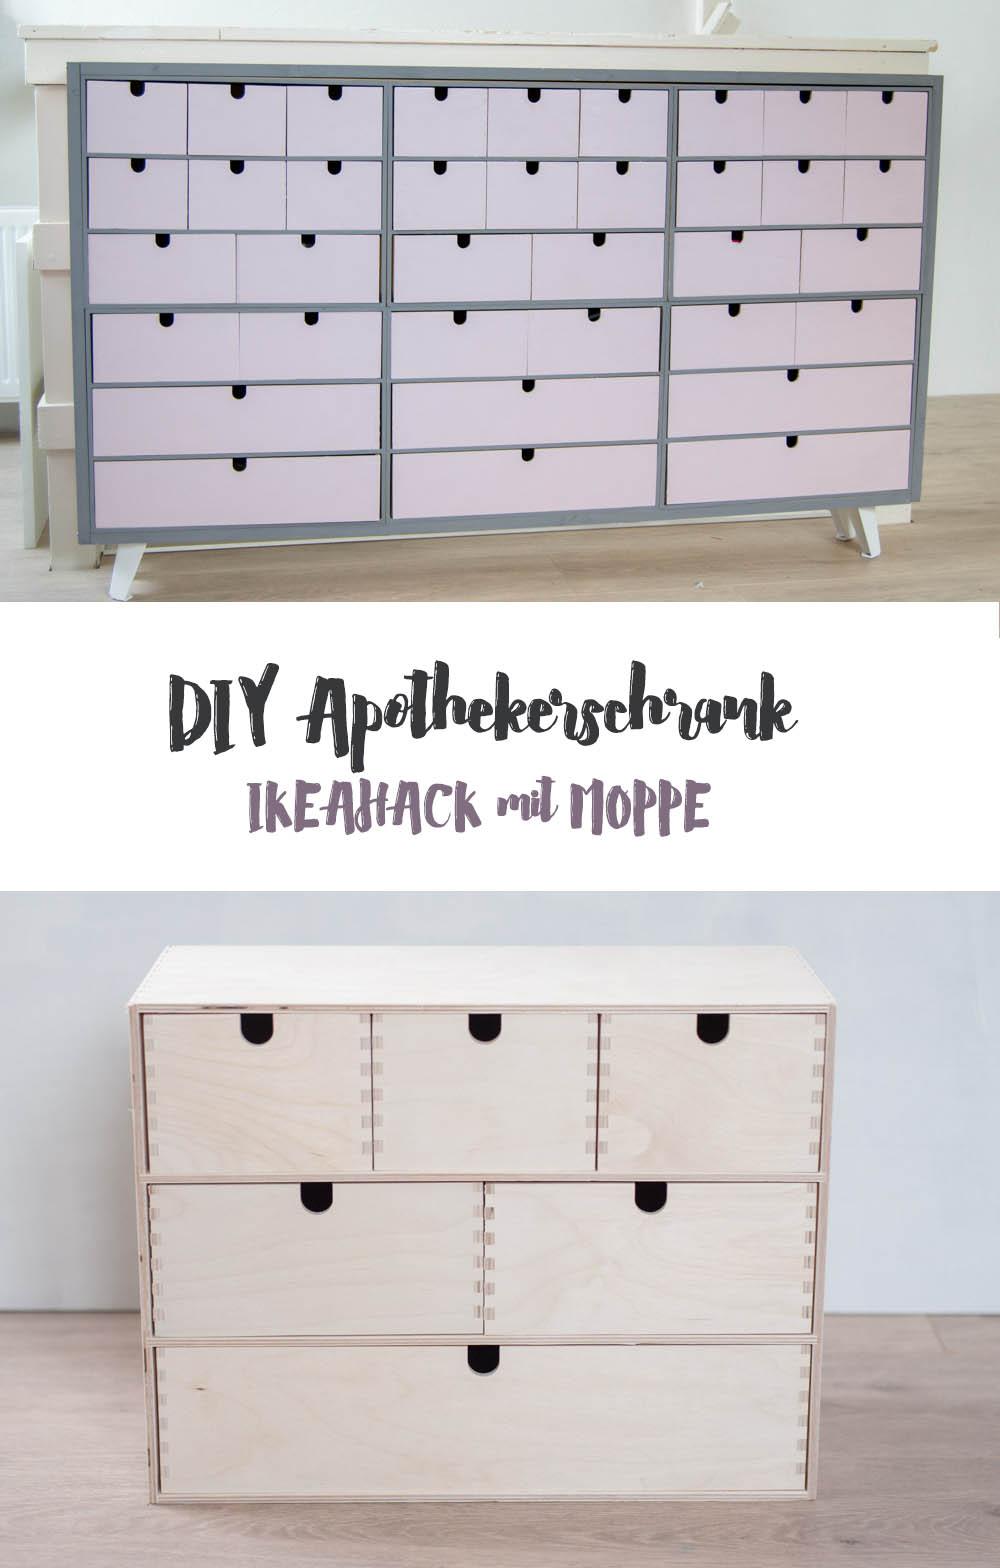 IKEAhack Apothekerschrank aus Moppe